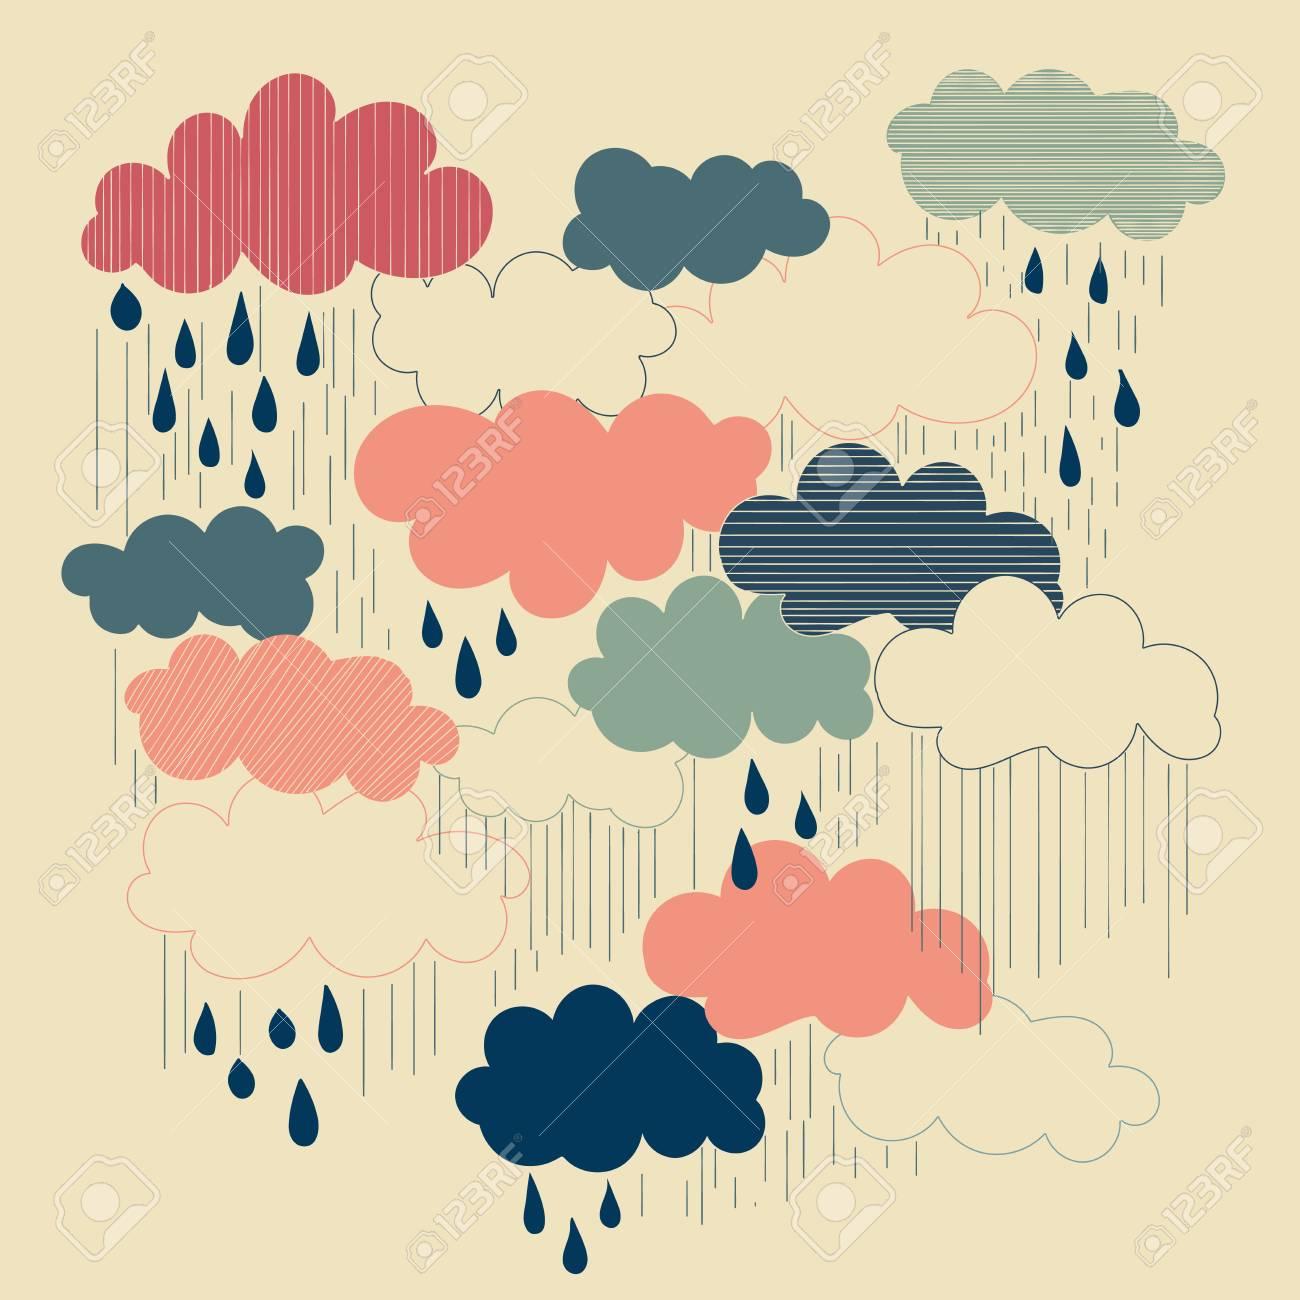 Rain season illustrations, clouds and raindrops in the sky  Retro